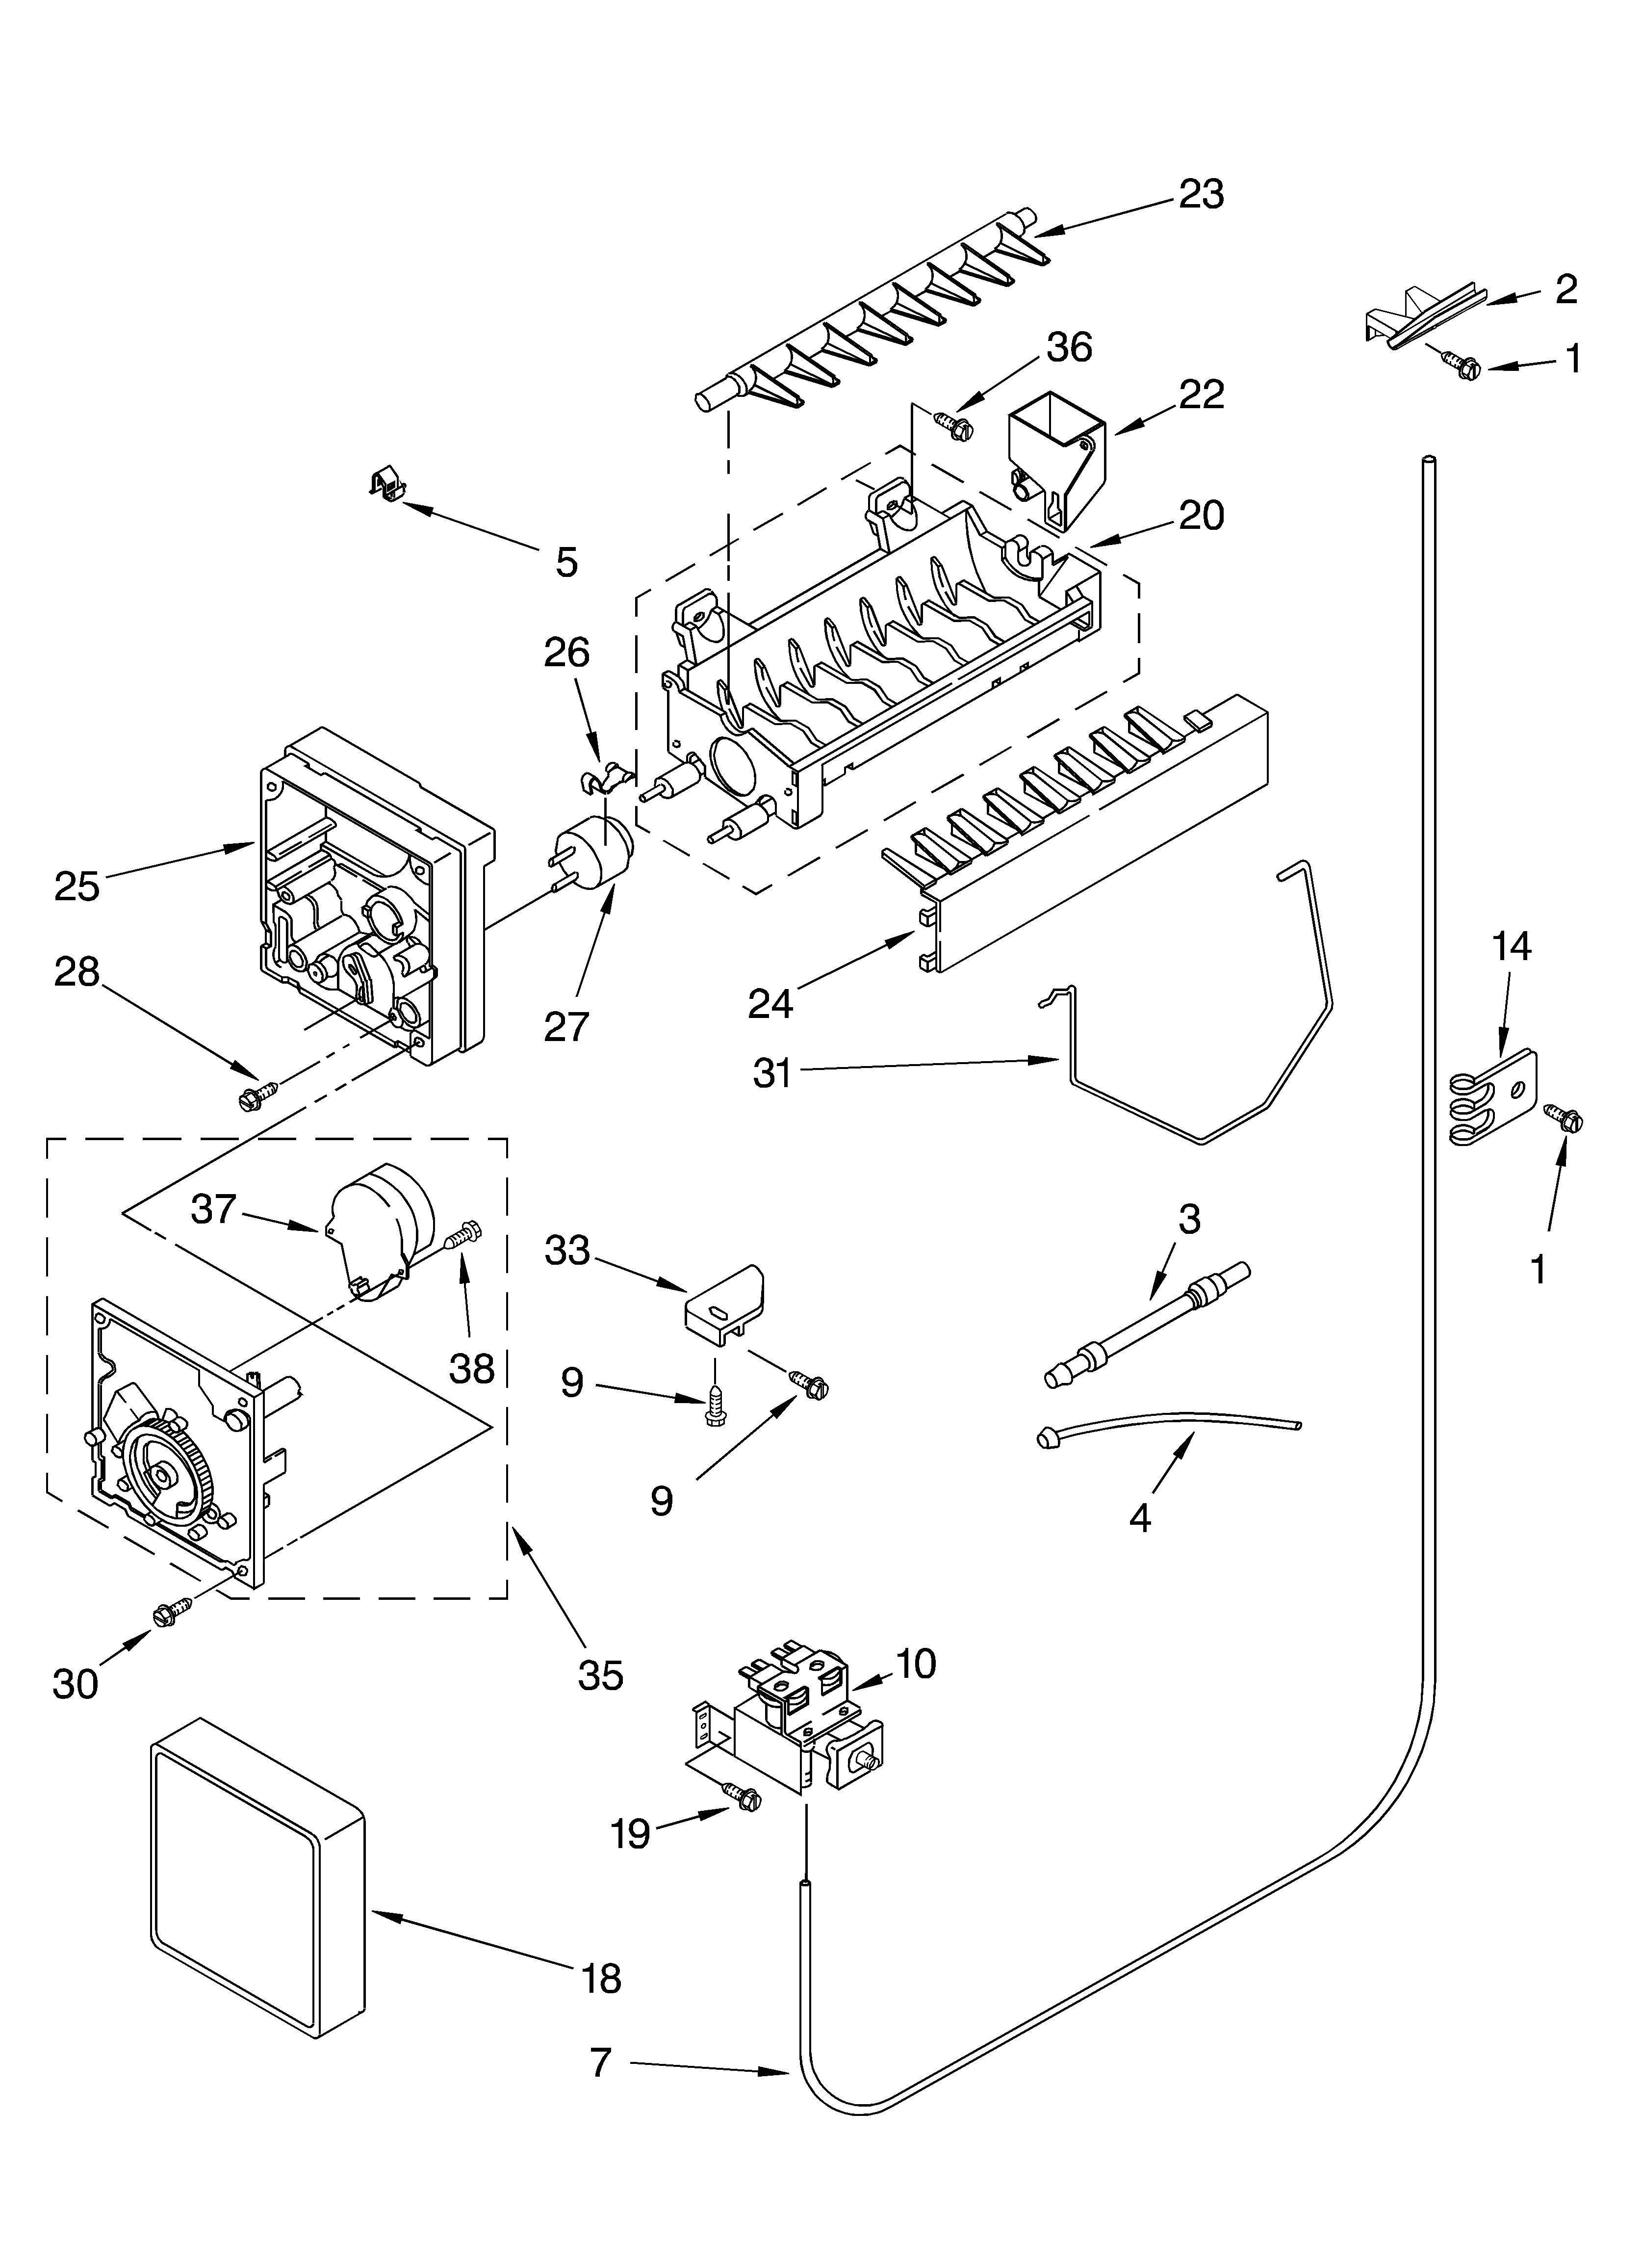 Auto Parts Diagram Kirkland Refrigerator Parts Model Ss25afxmq00 Of Auto Parts Diagram